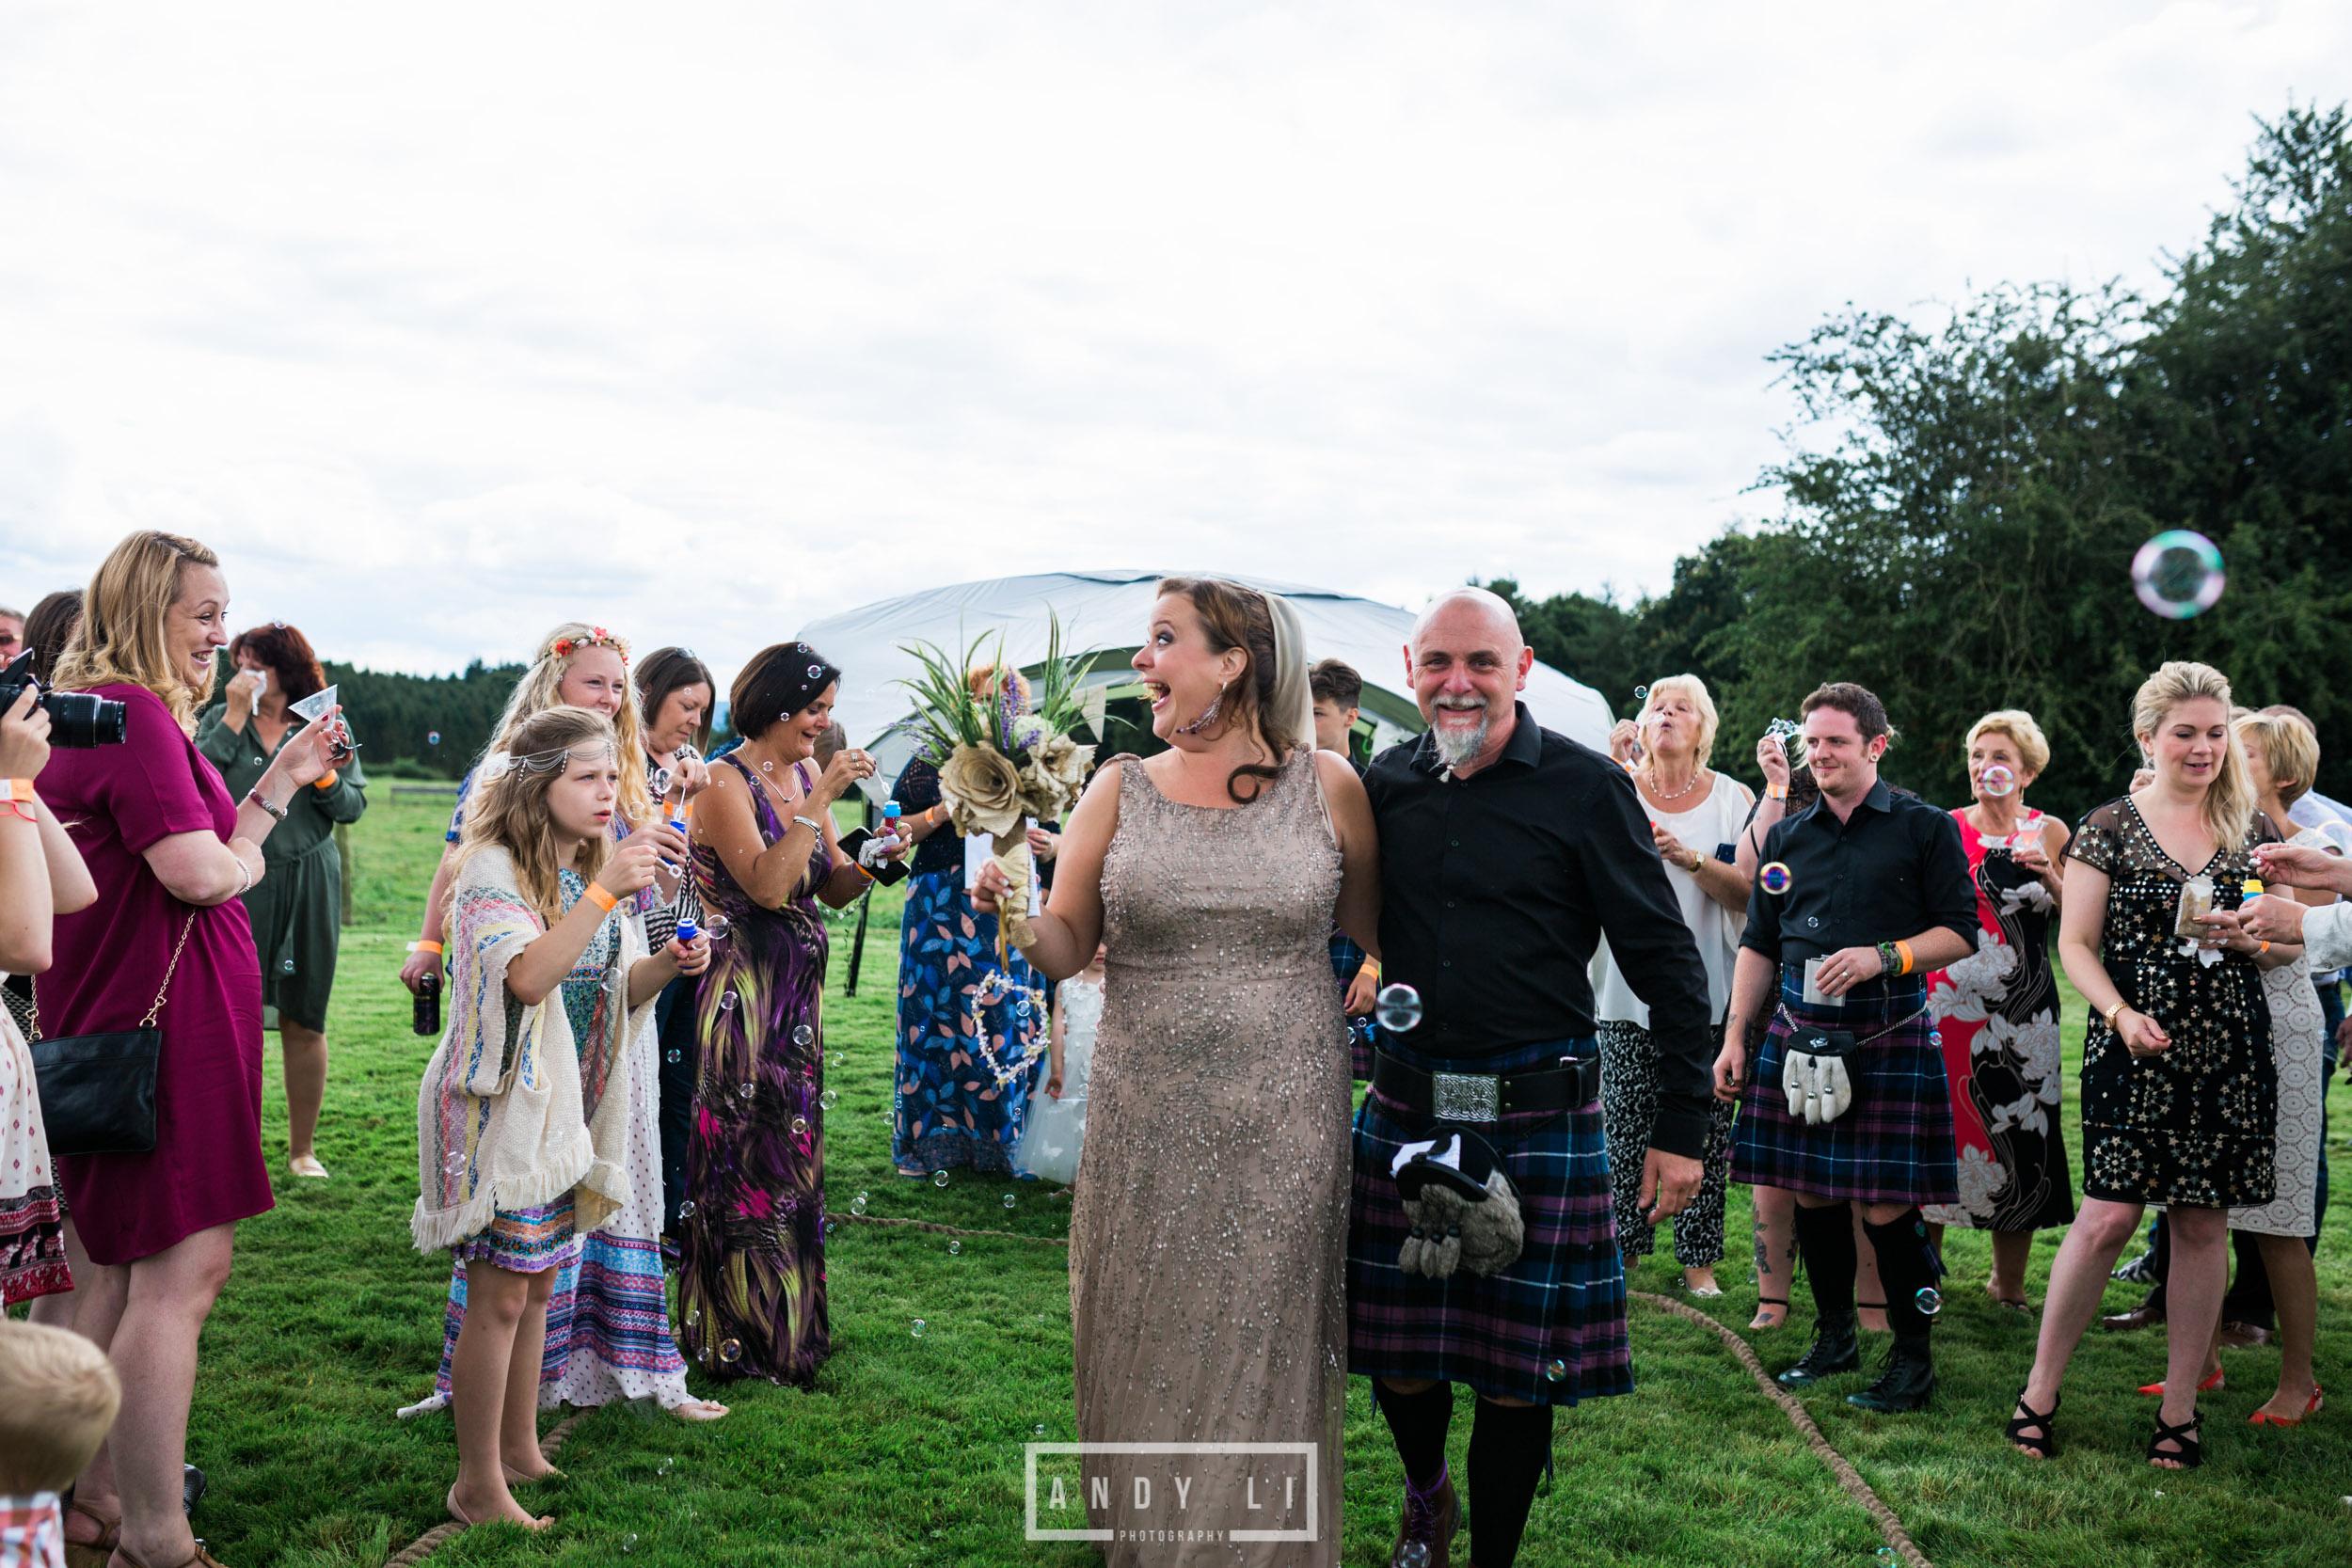 Festival Wedding Shropshire-Andy Li Photography-159.jpg